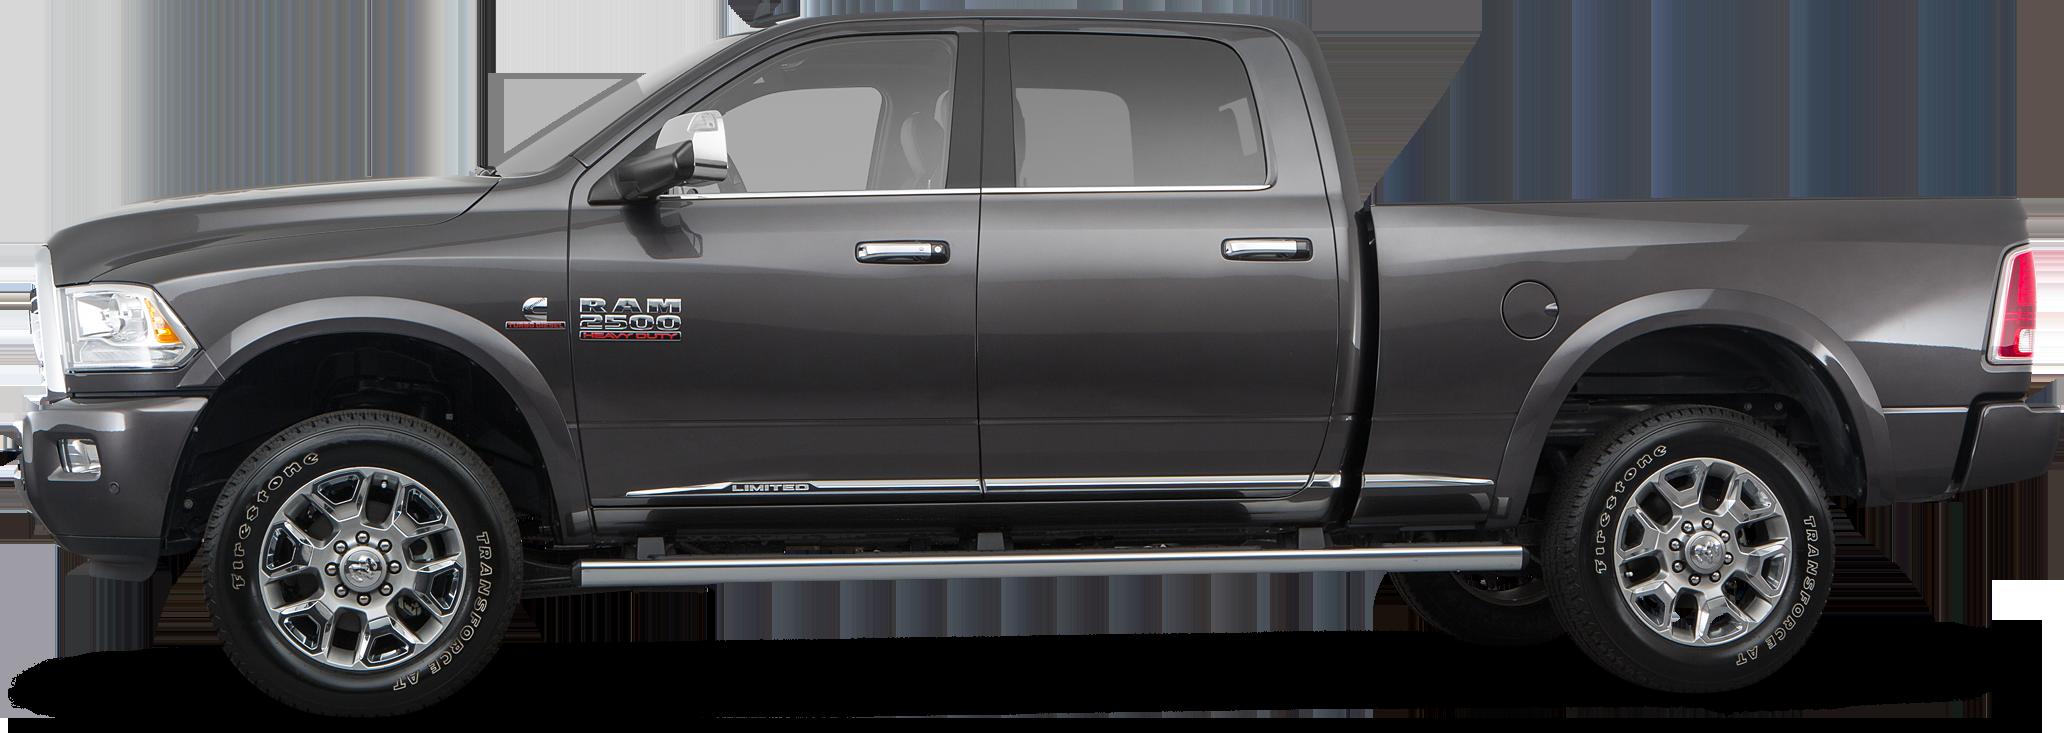 2018 Ram 2500 Truck SLT